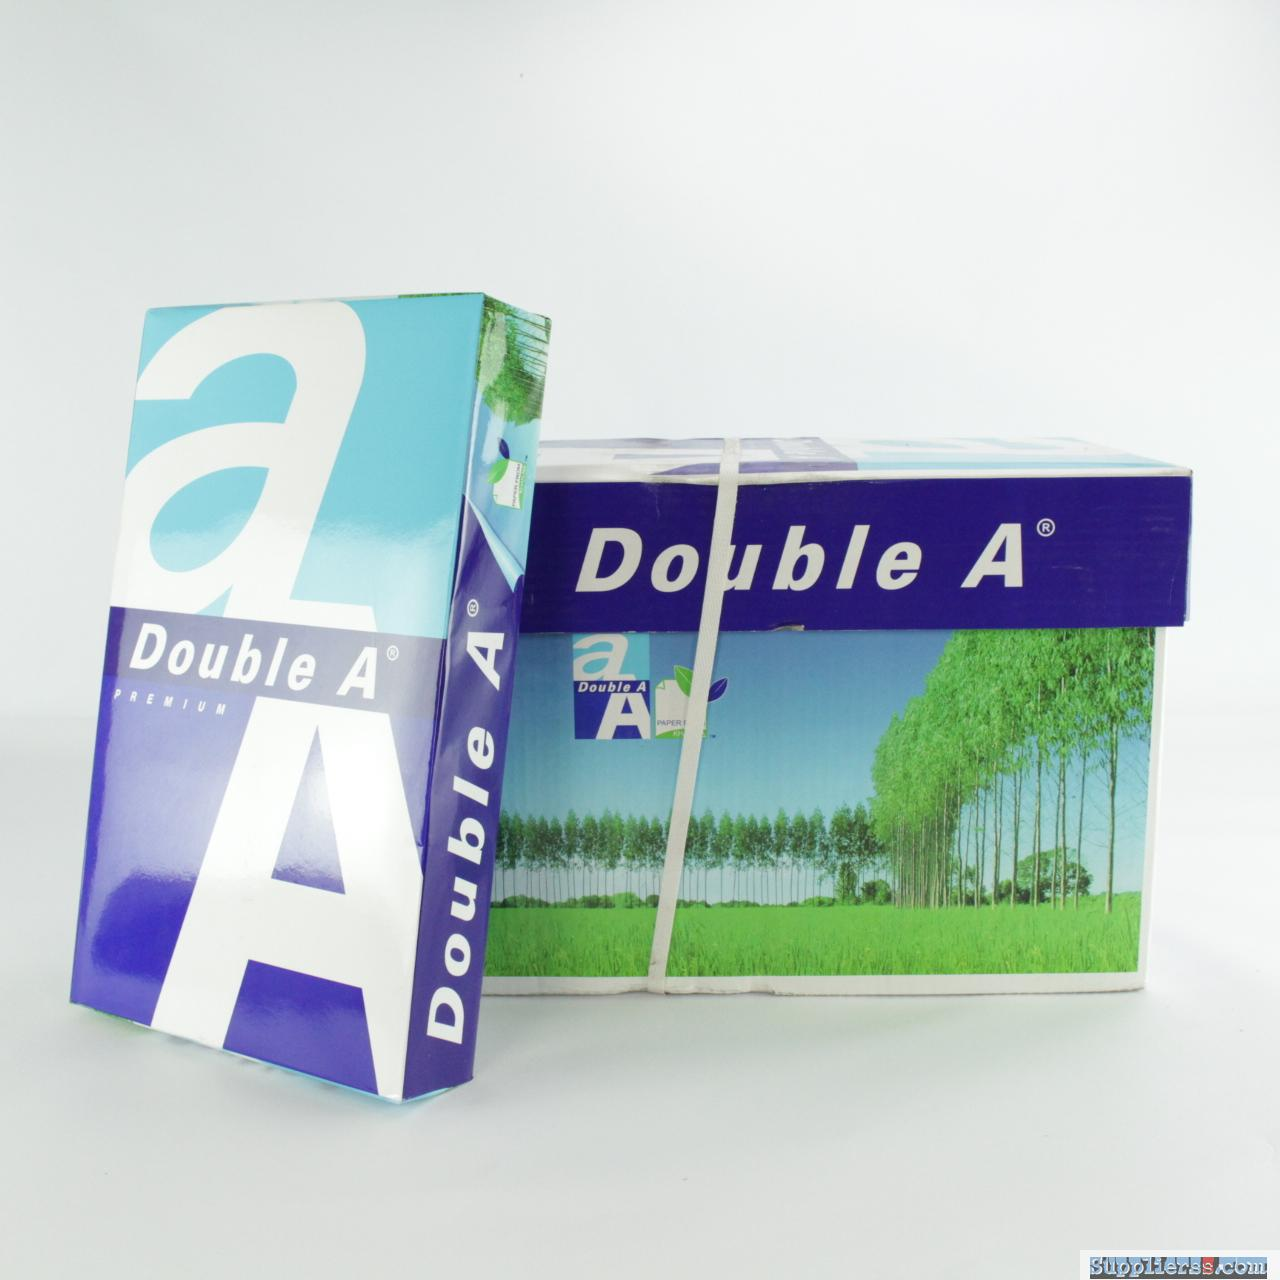 Double A A4 Copy Paper Thailand 70 GSM 80gsm Manufacturer